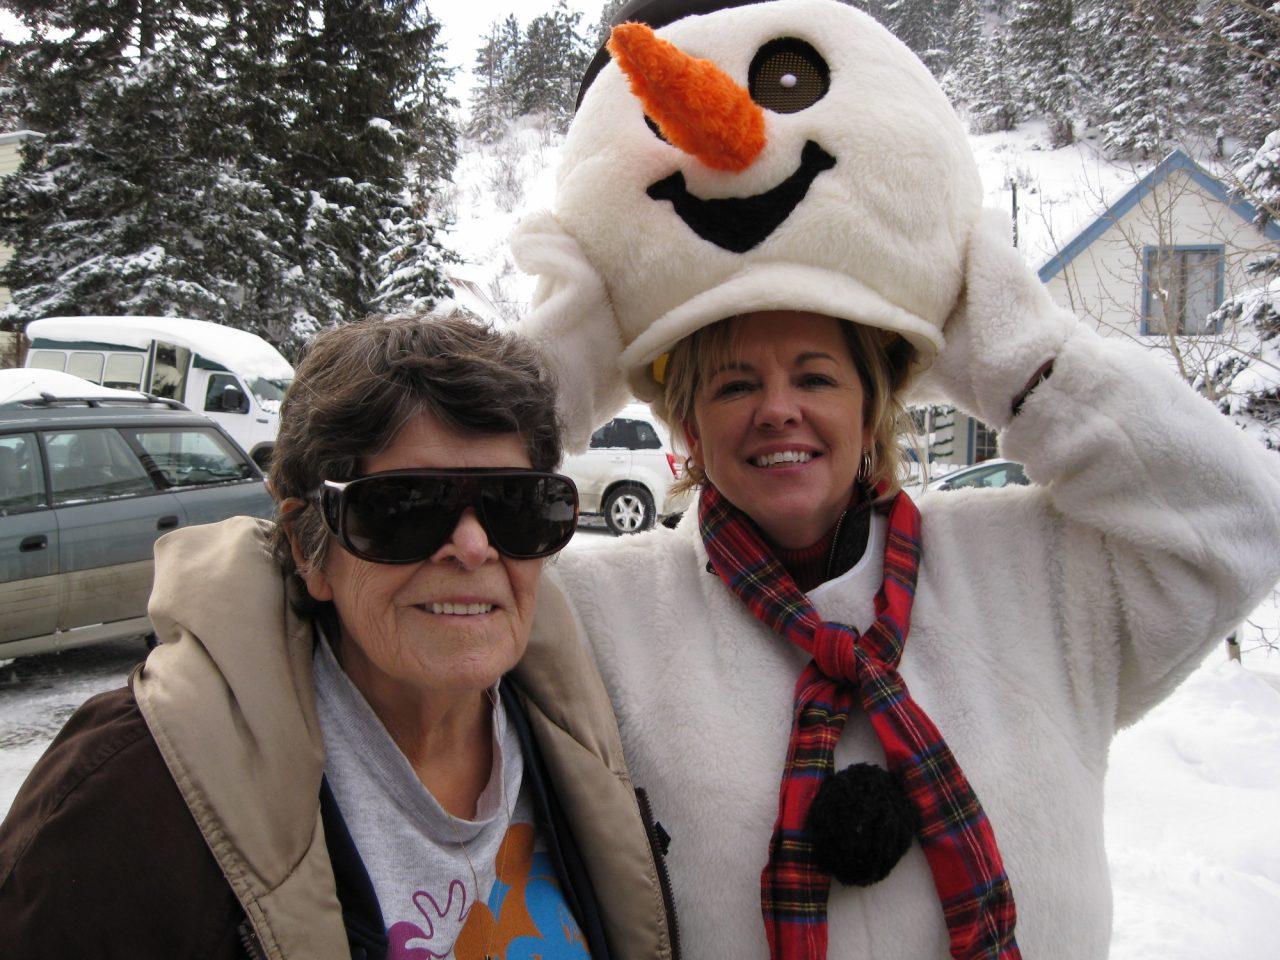 JoAnn's volunteer work with senior citizens